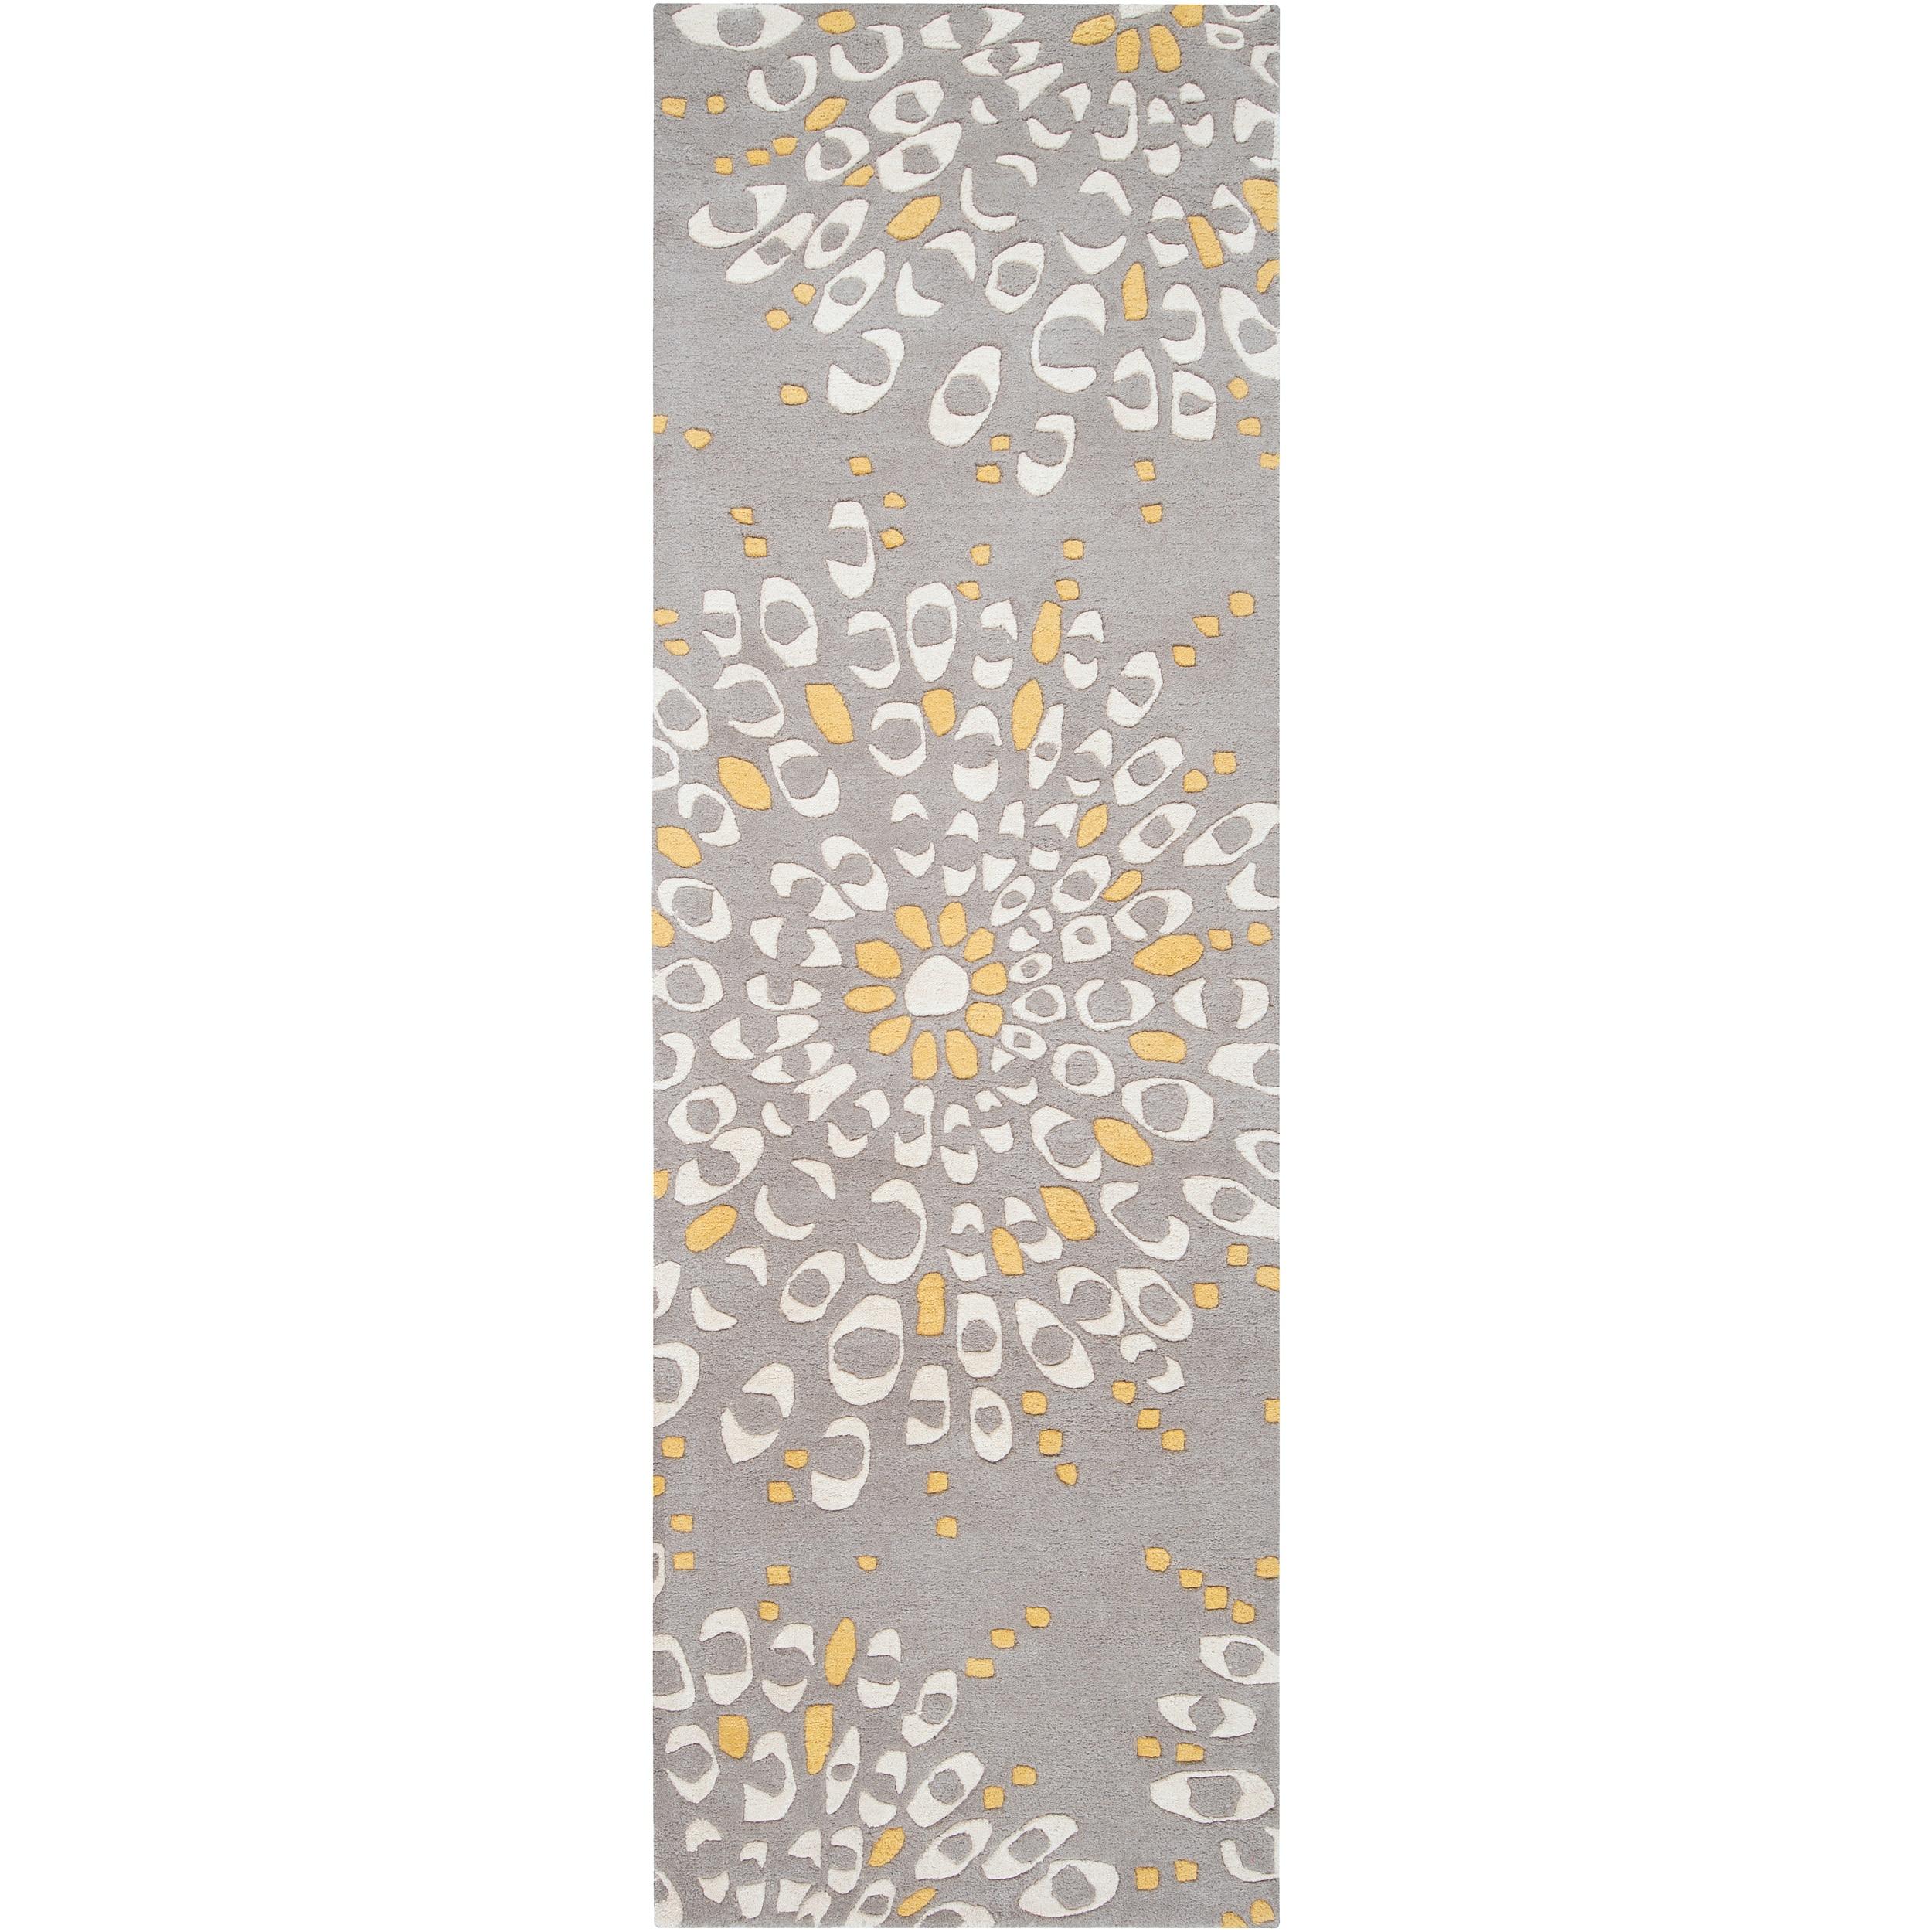 Hand-tufted Contemporary Gray Zandoline New Zealand Wool Abstract Rug (2'6 x 8')